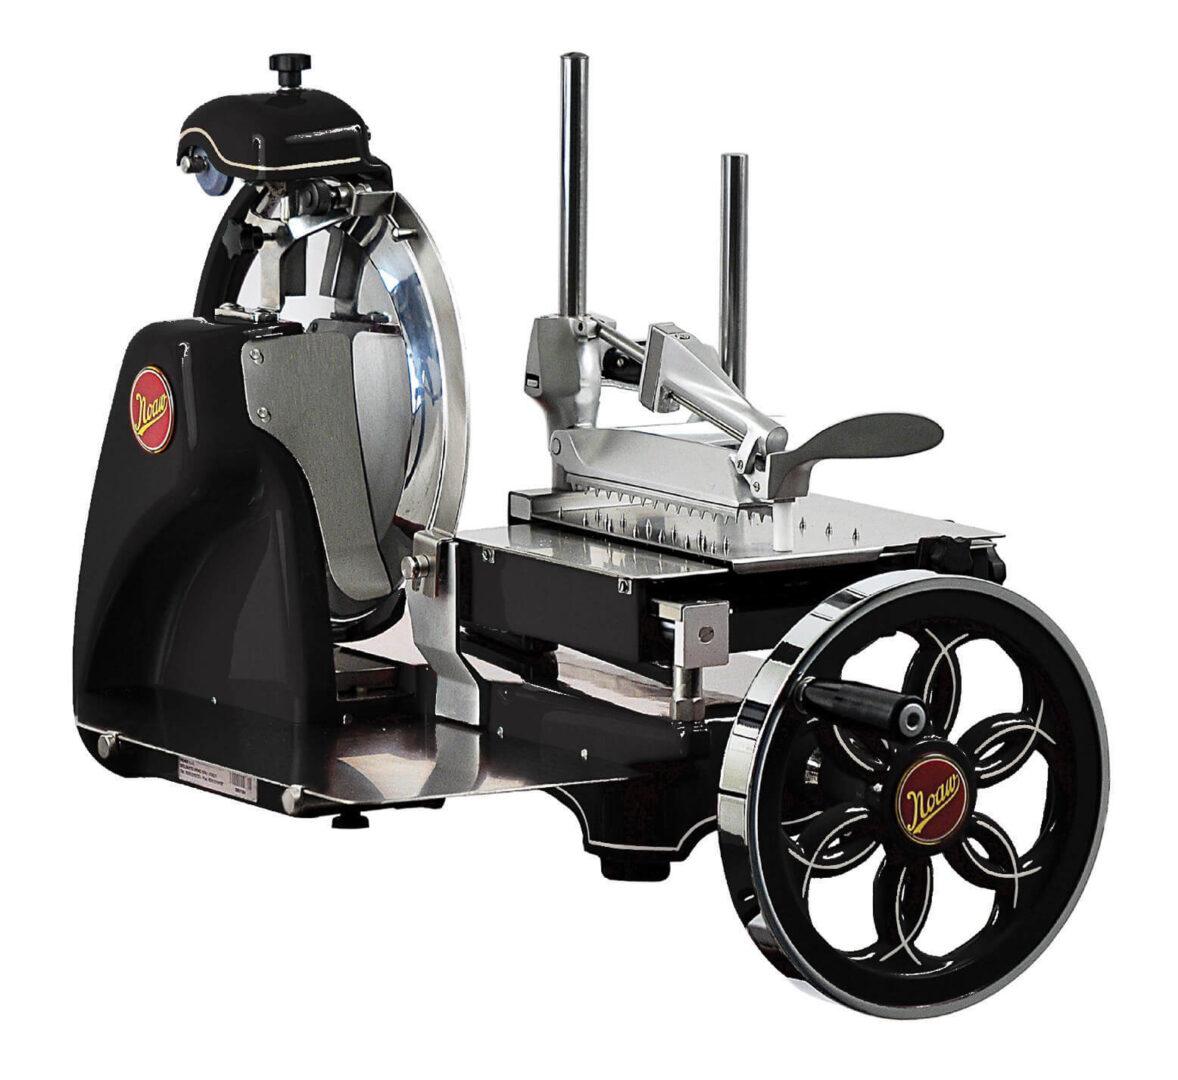 NOAW Retro Black Flywheel Slicer